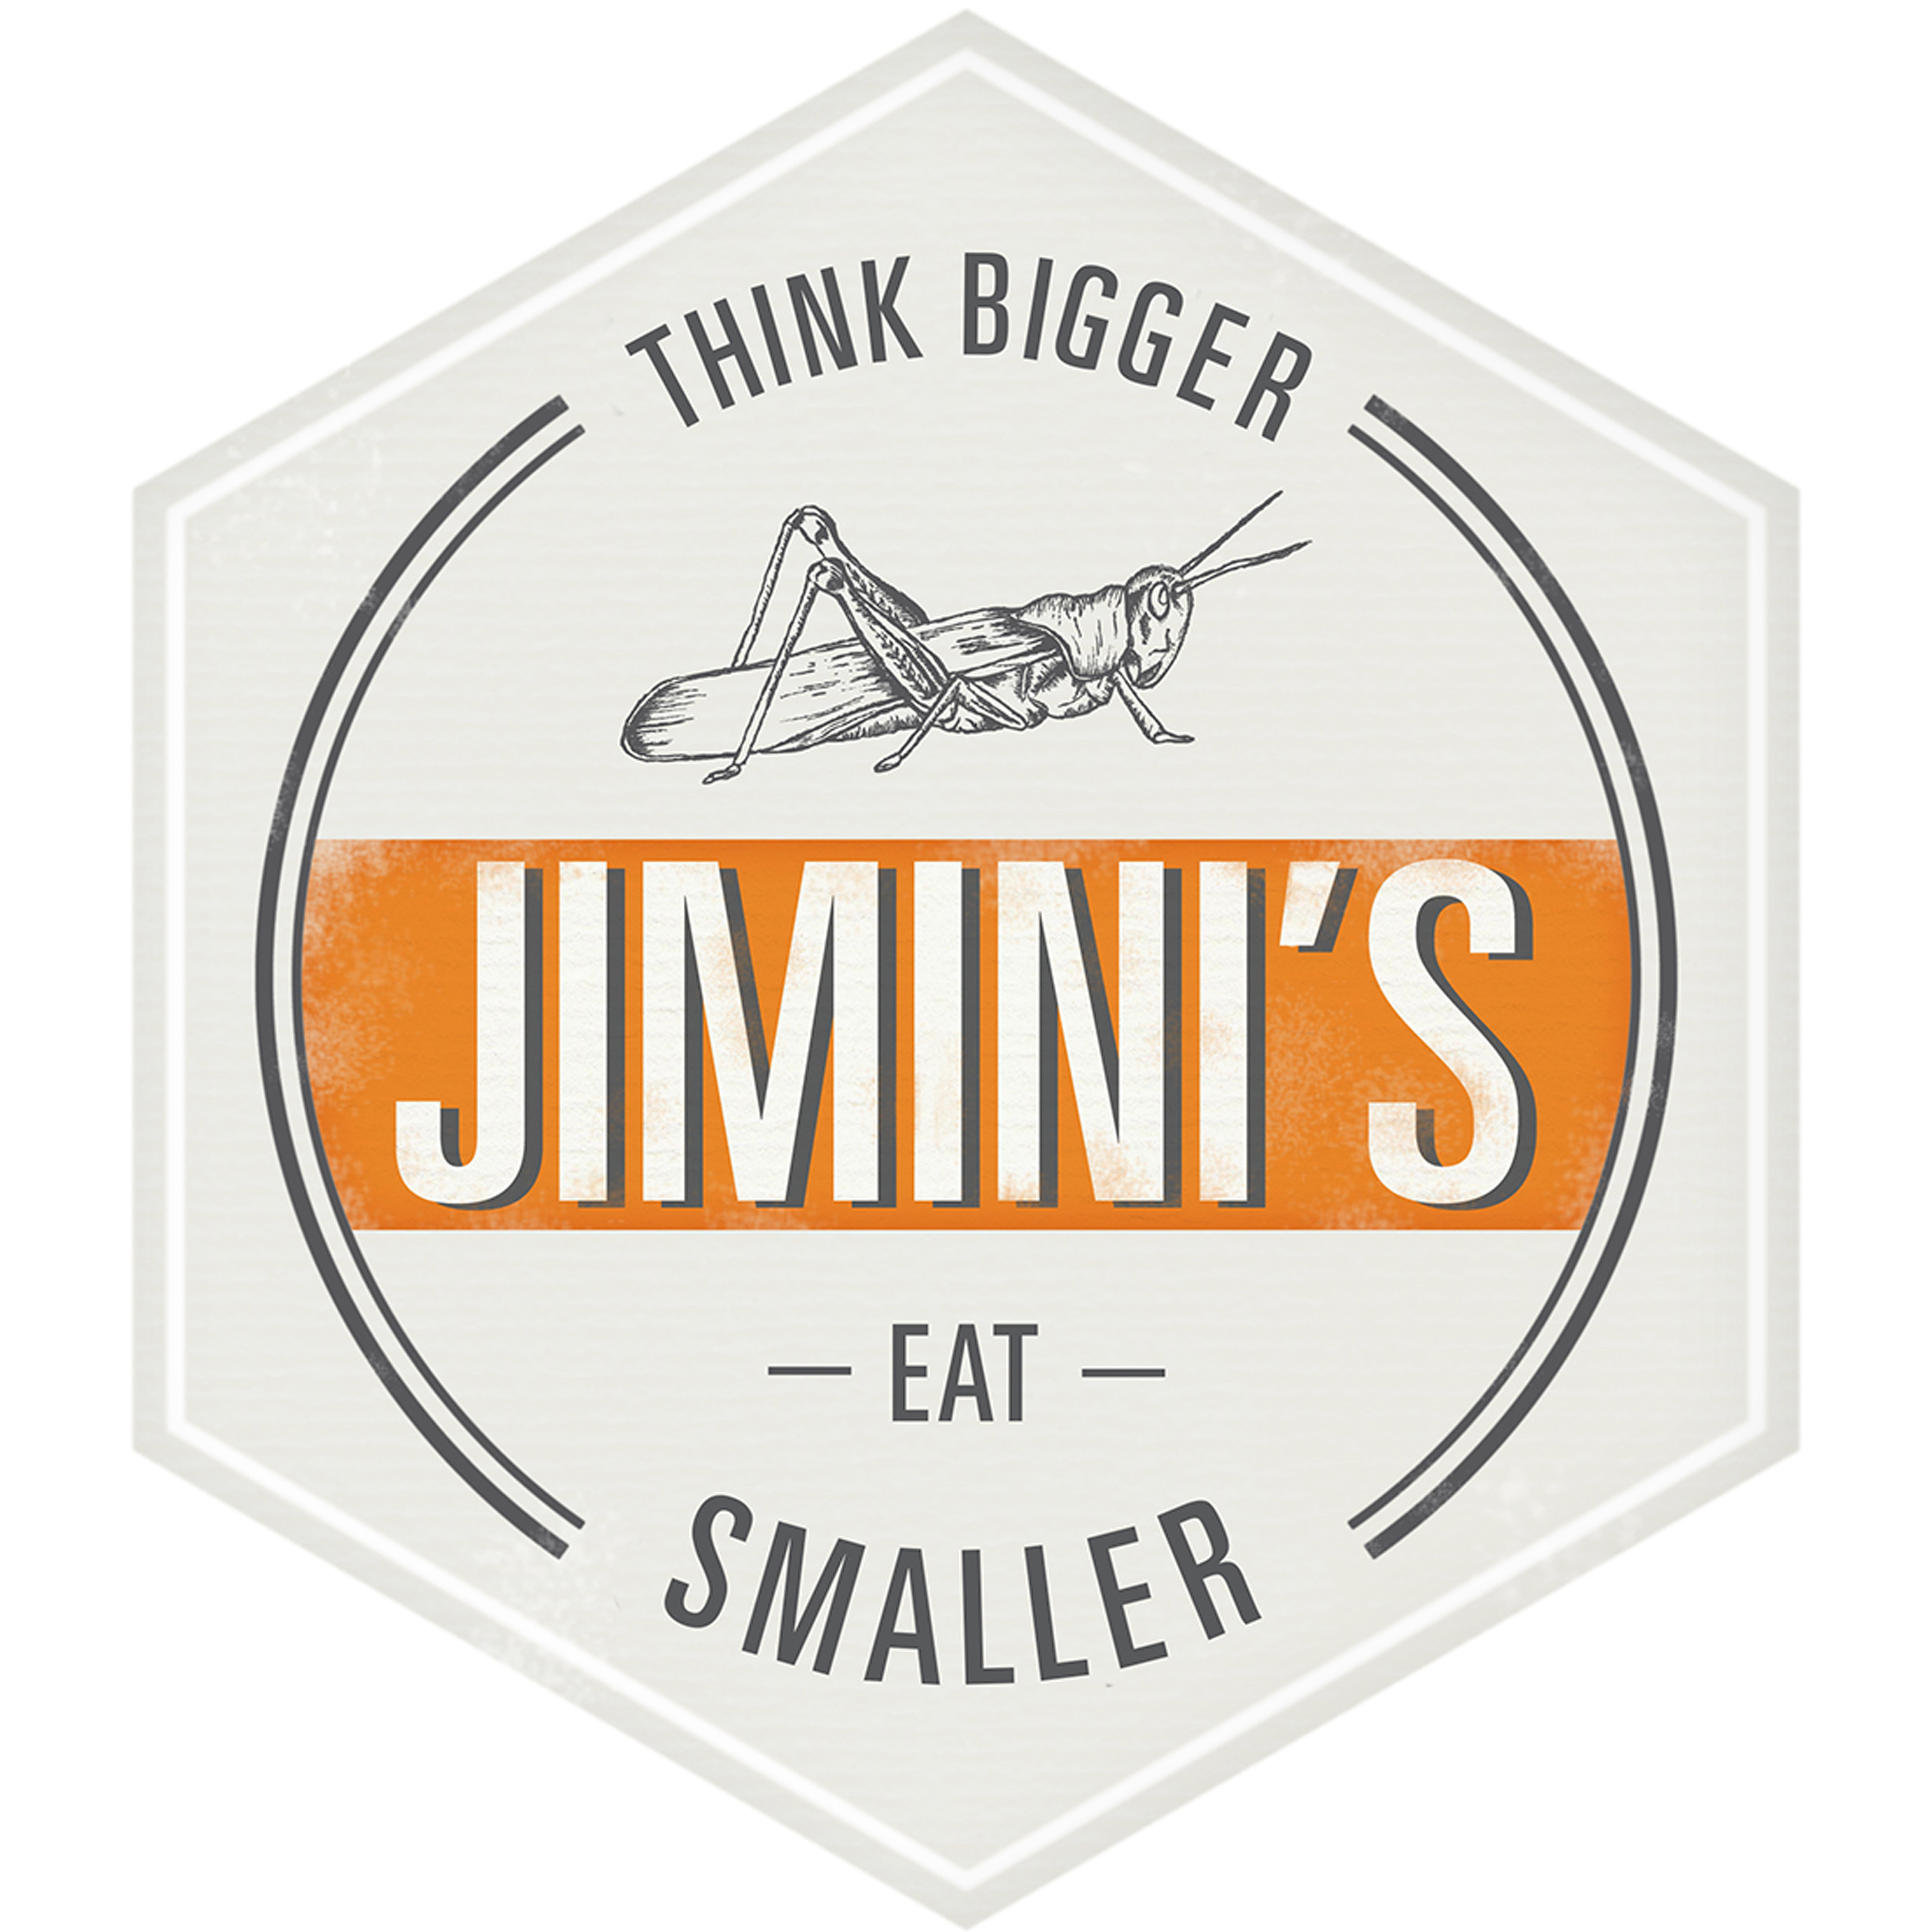 logo-JIMINIS-HD (2).jpg